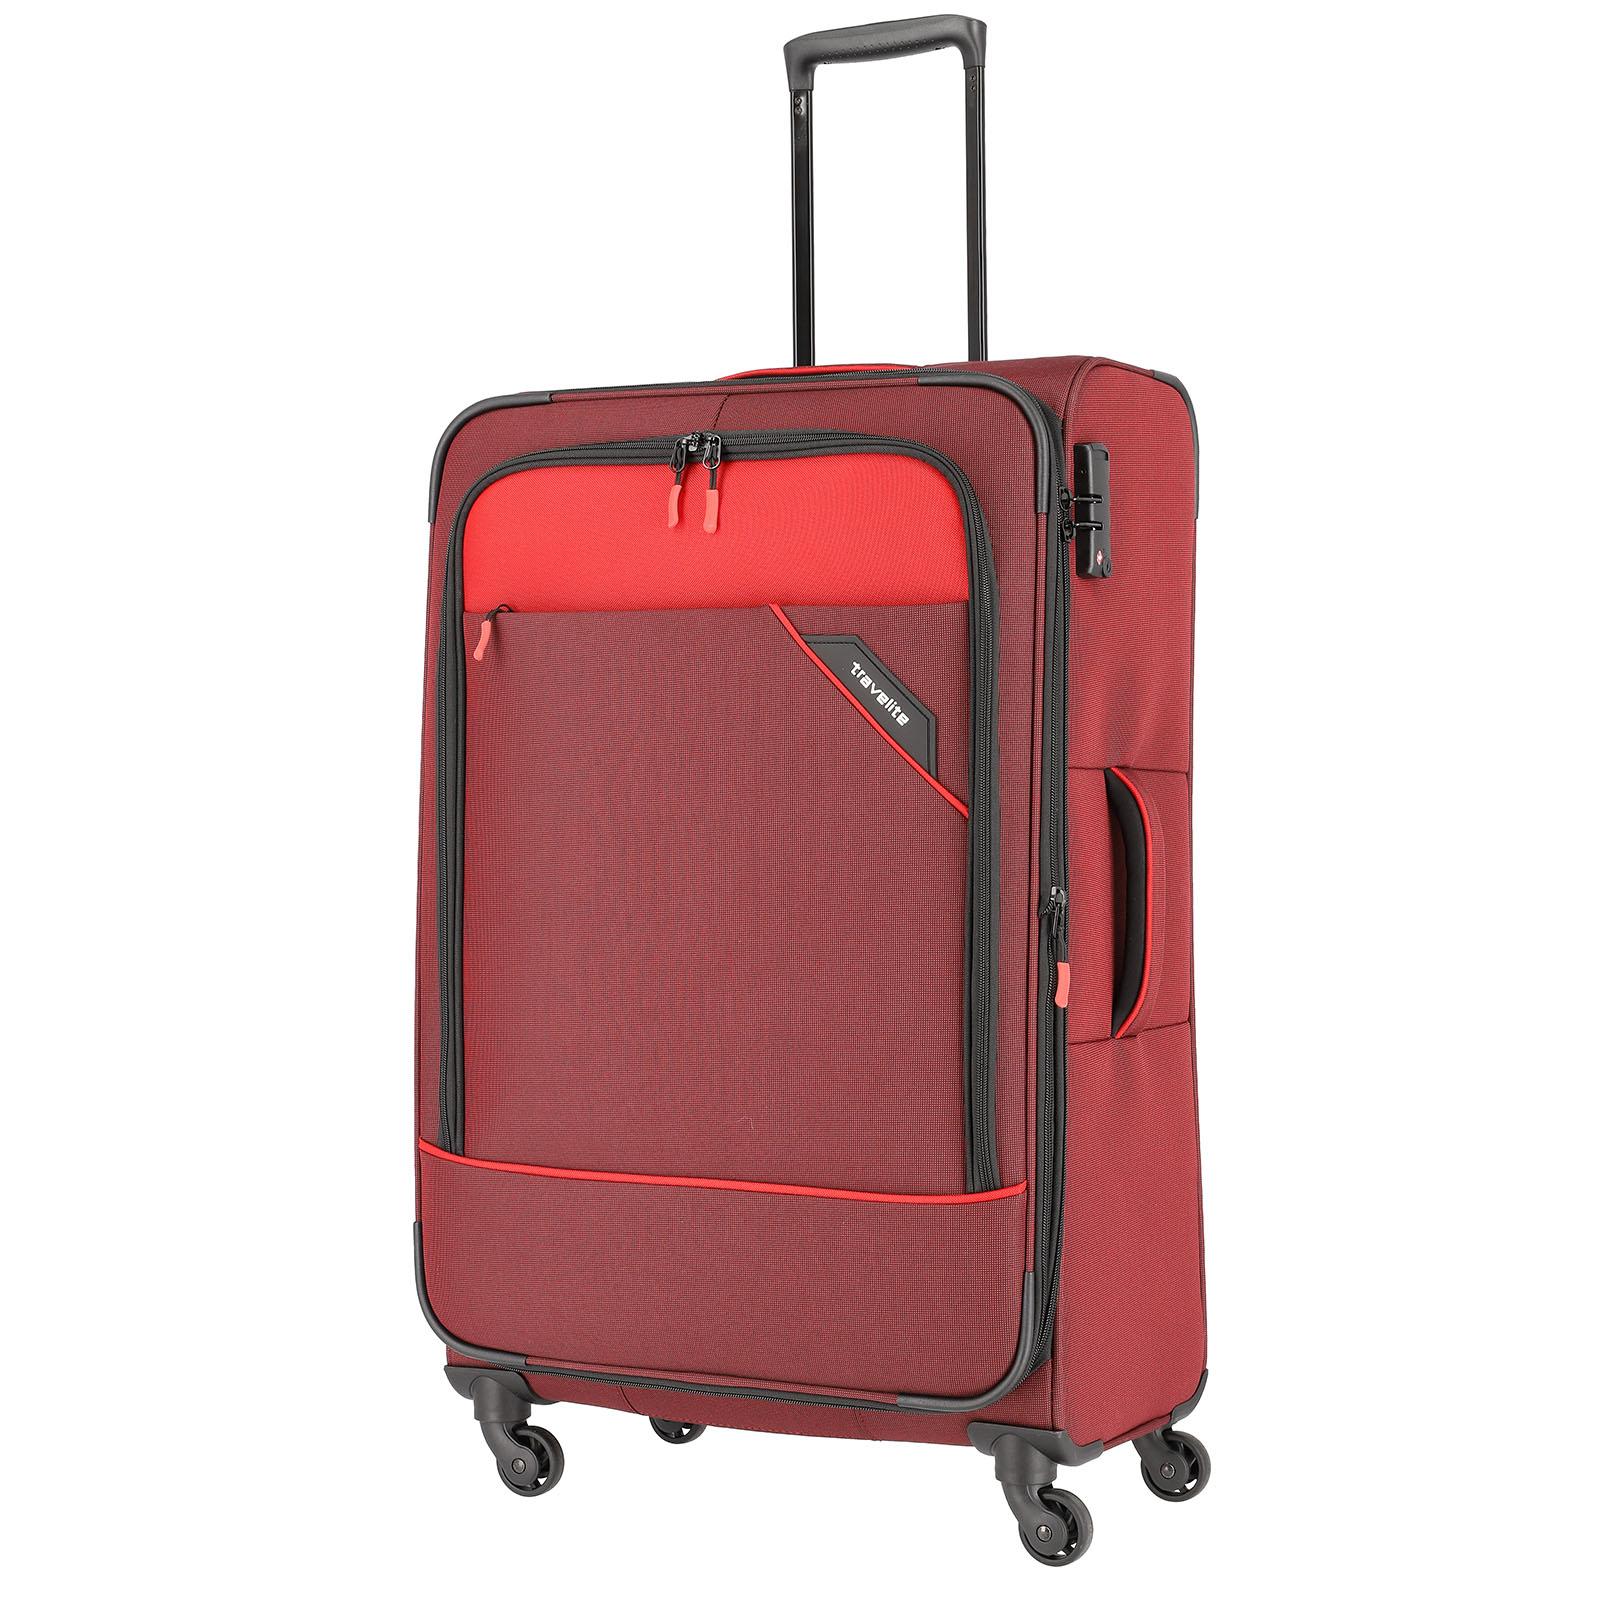 travelite-derby-rot-77cm-stoff-trolley